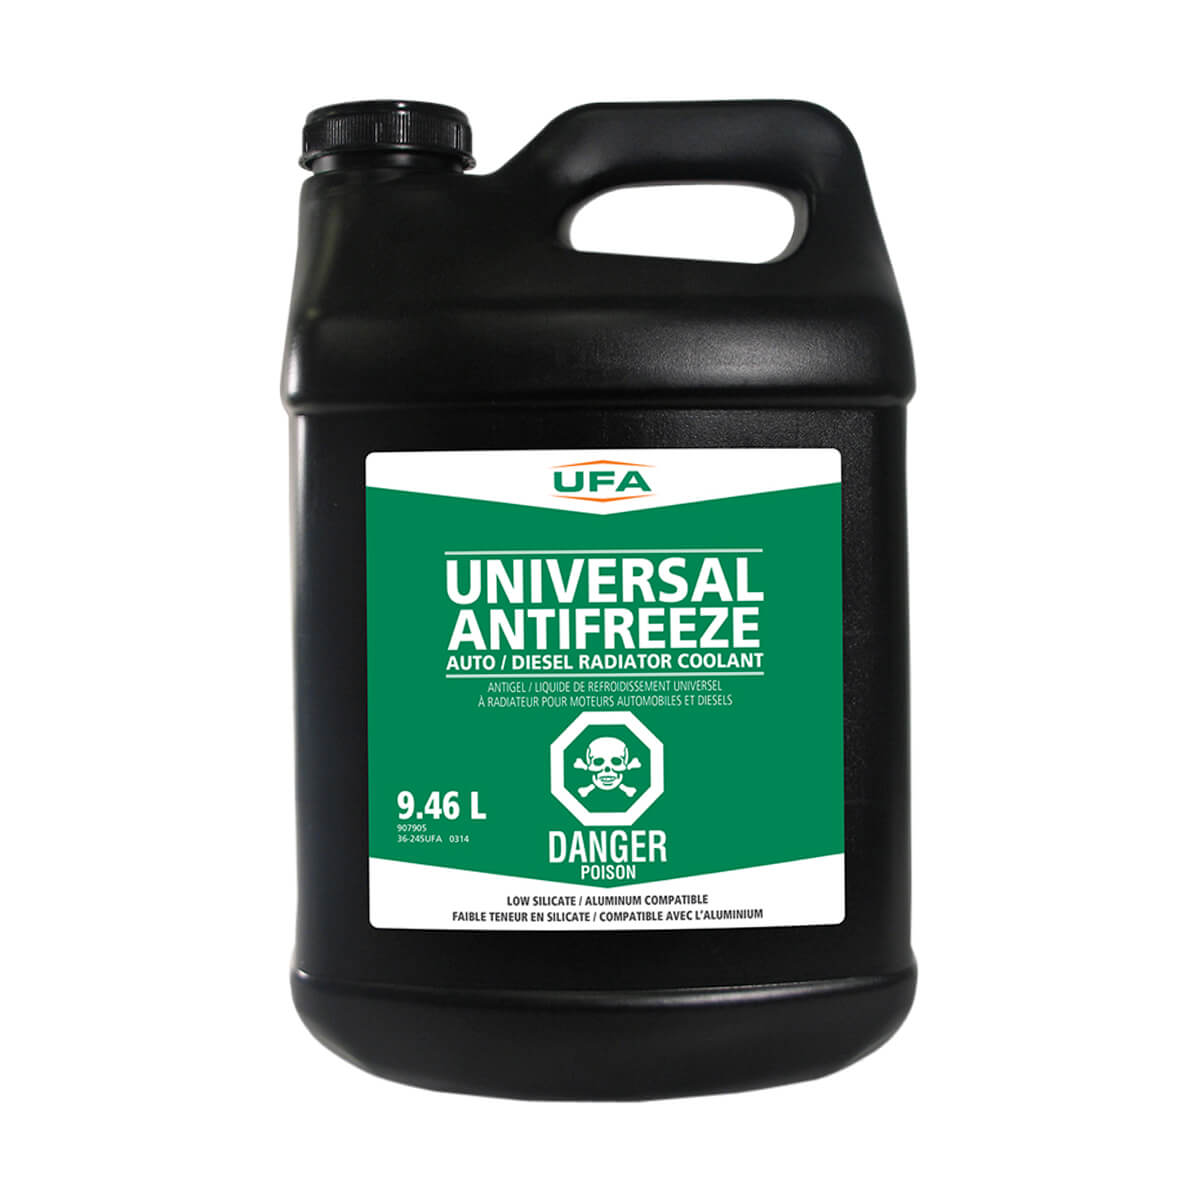 Universal Antifreeze - 9.46L